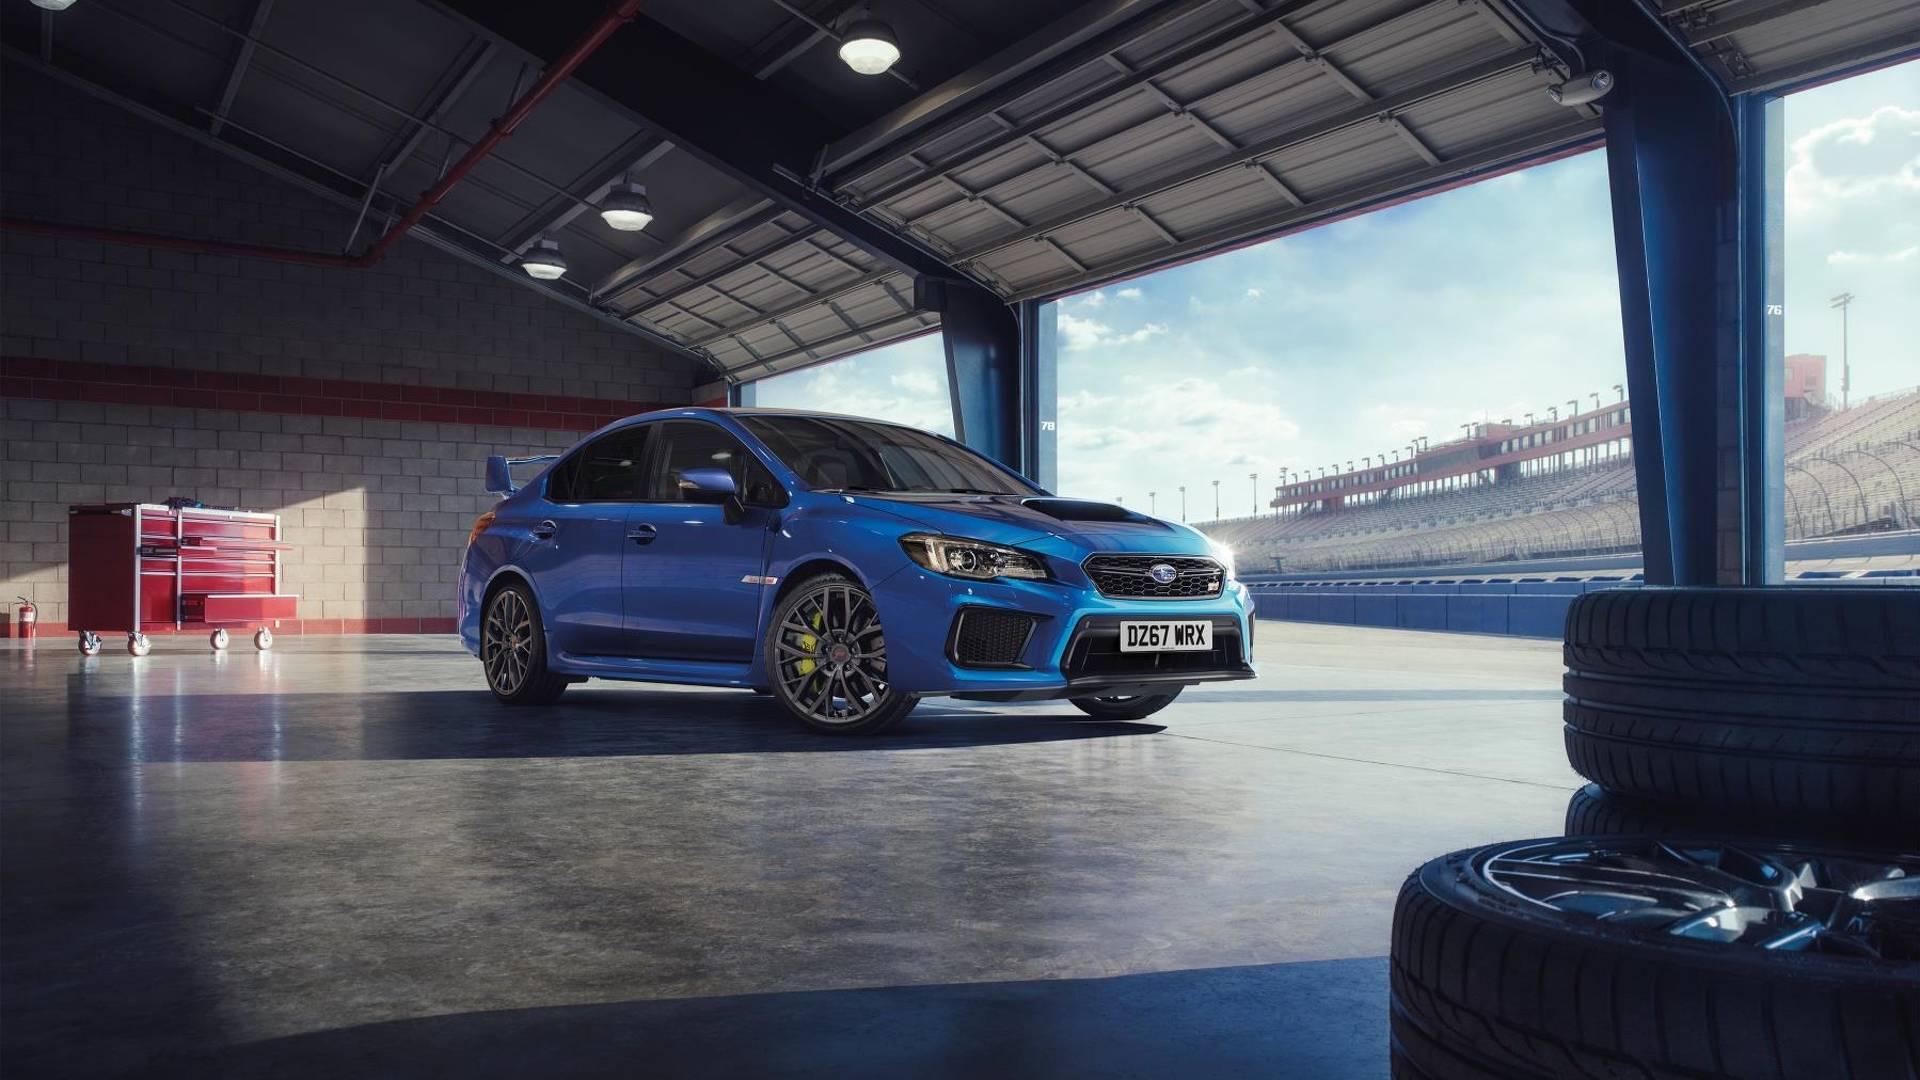 2018 Subaru Wrx Sti Final Edition Uk Model